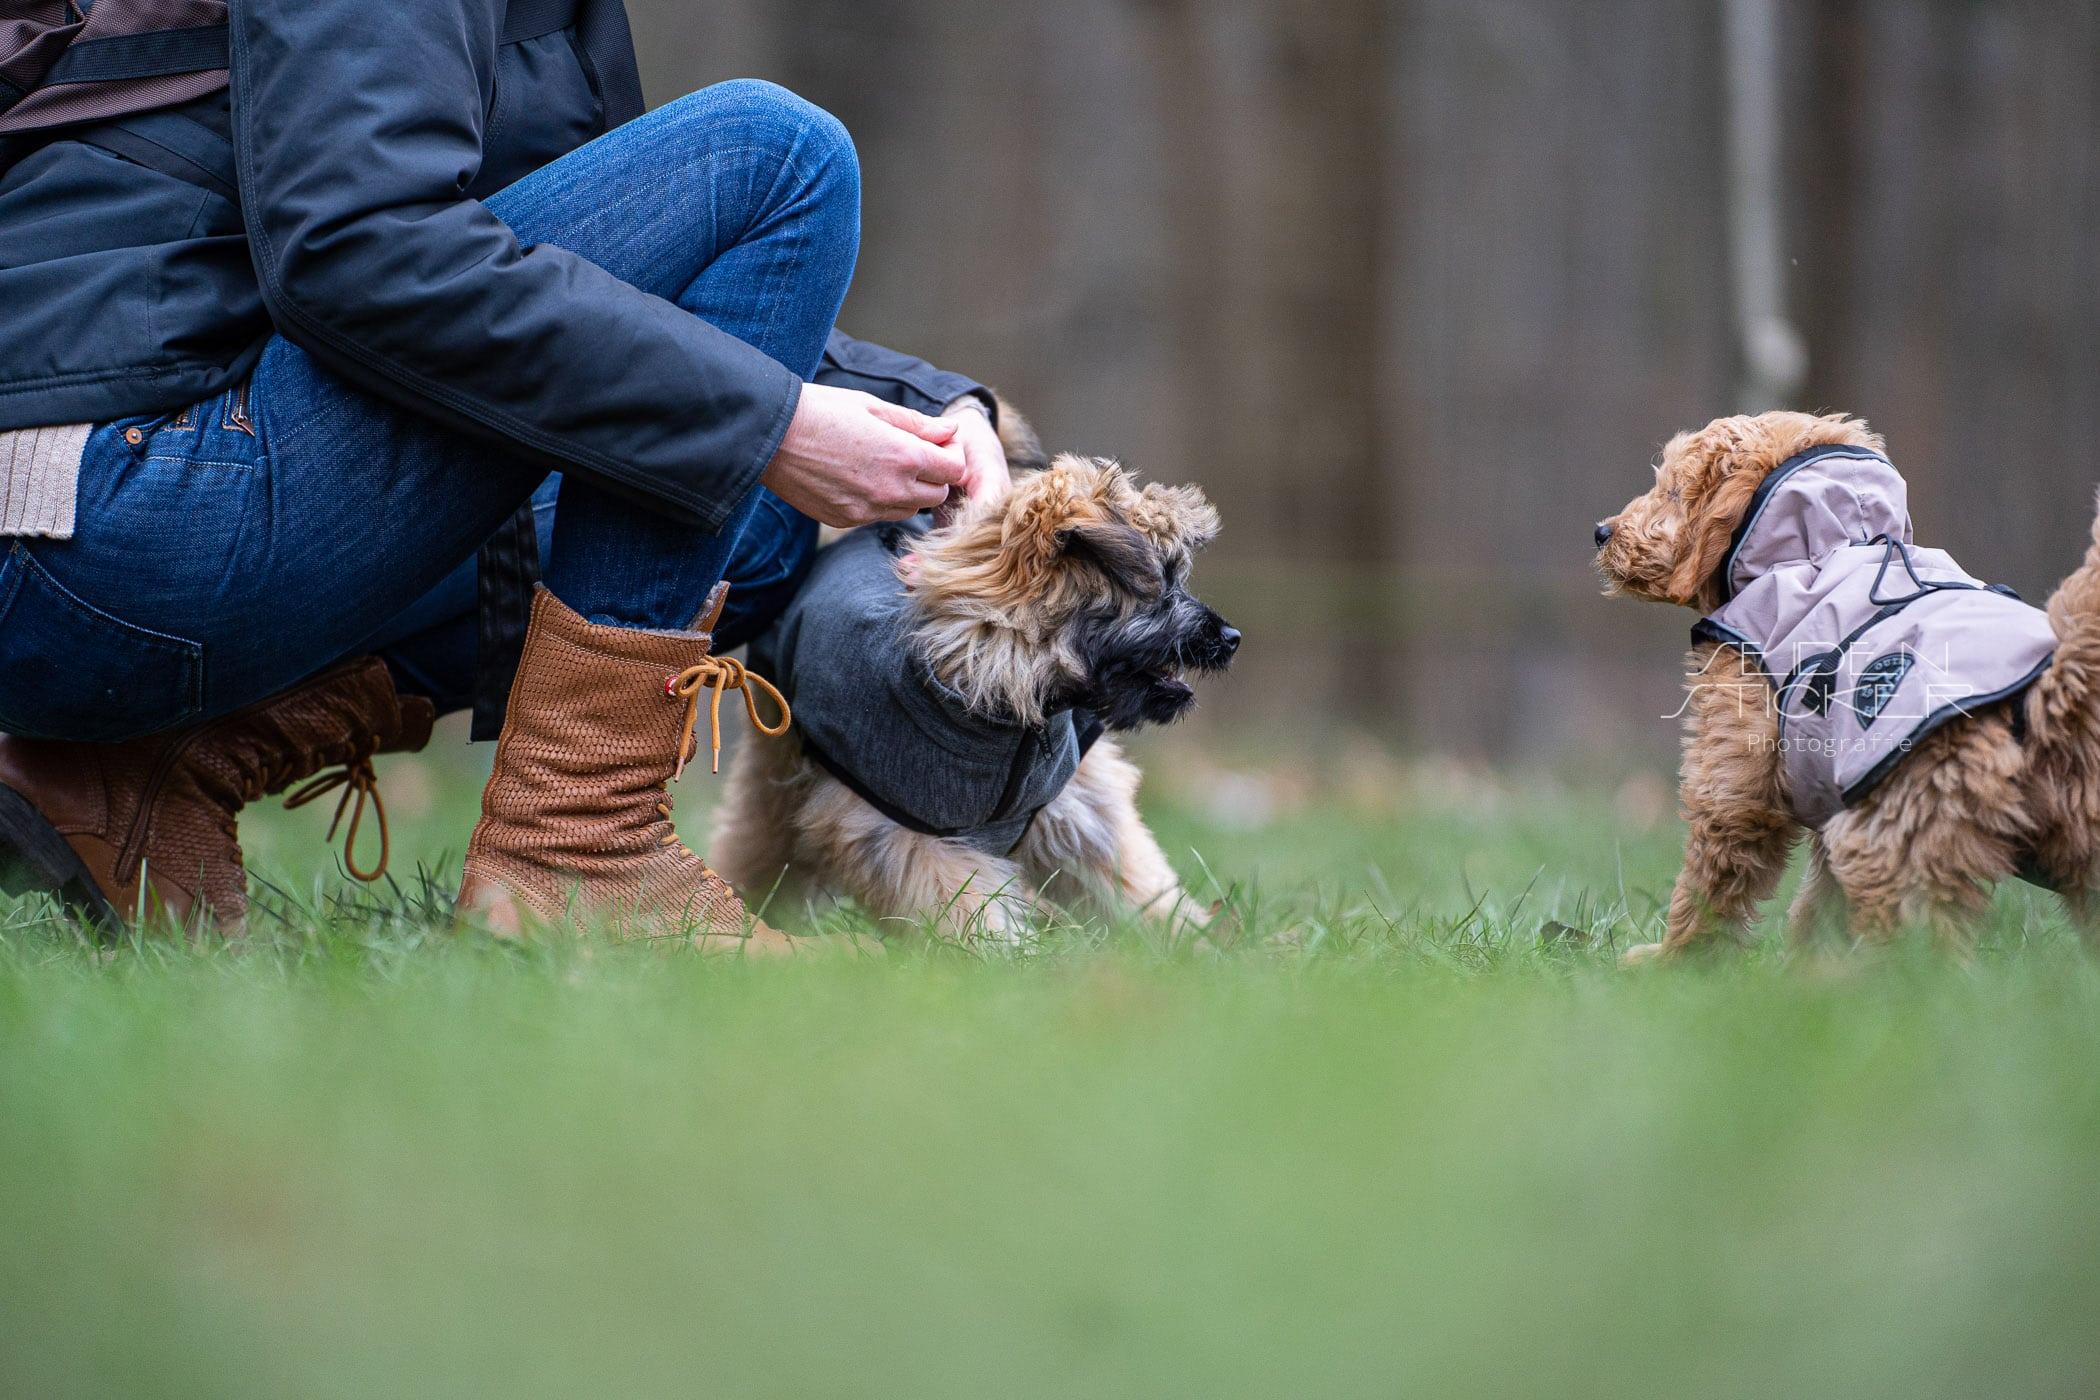 Seidensticker Fotografie - Hundeschule Bruns, Hannover